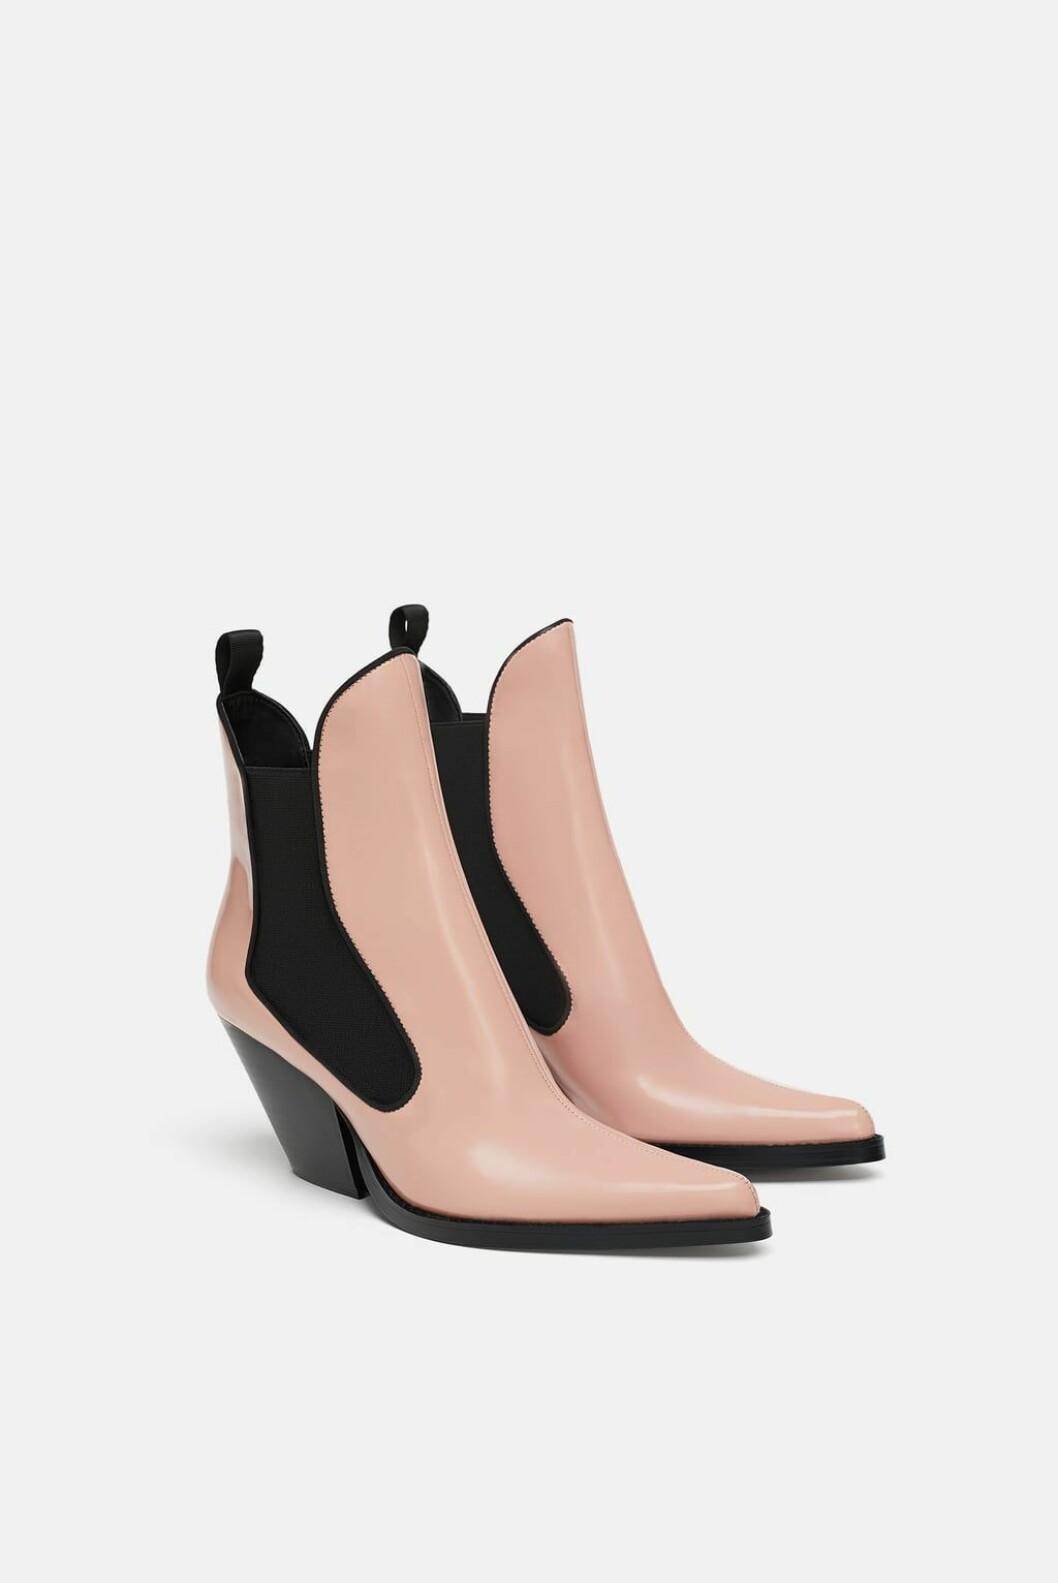 Boots fra Zara  700,-  https://www.zara.com/no/no/cowboyskolett-p17112301.html?v1=6682507&v2=1074625